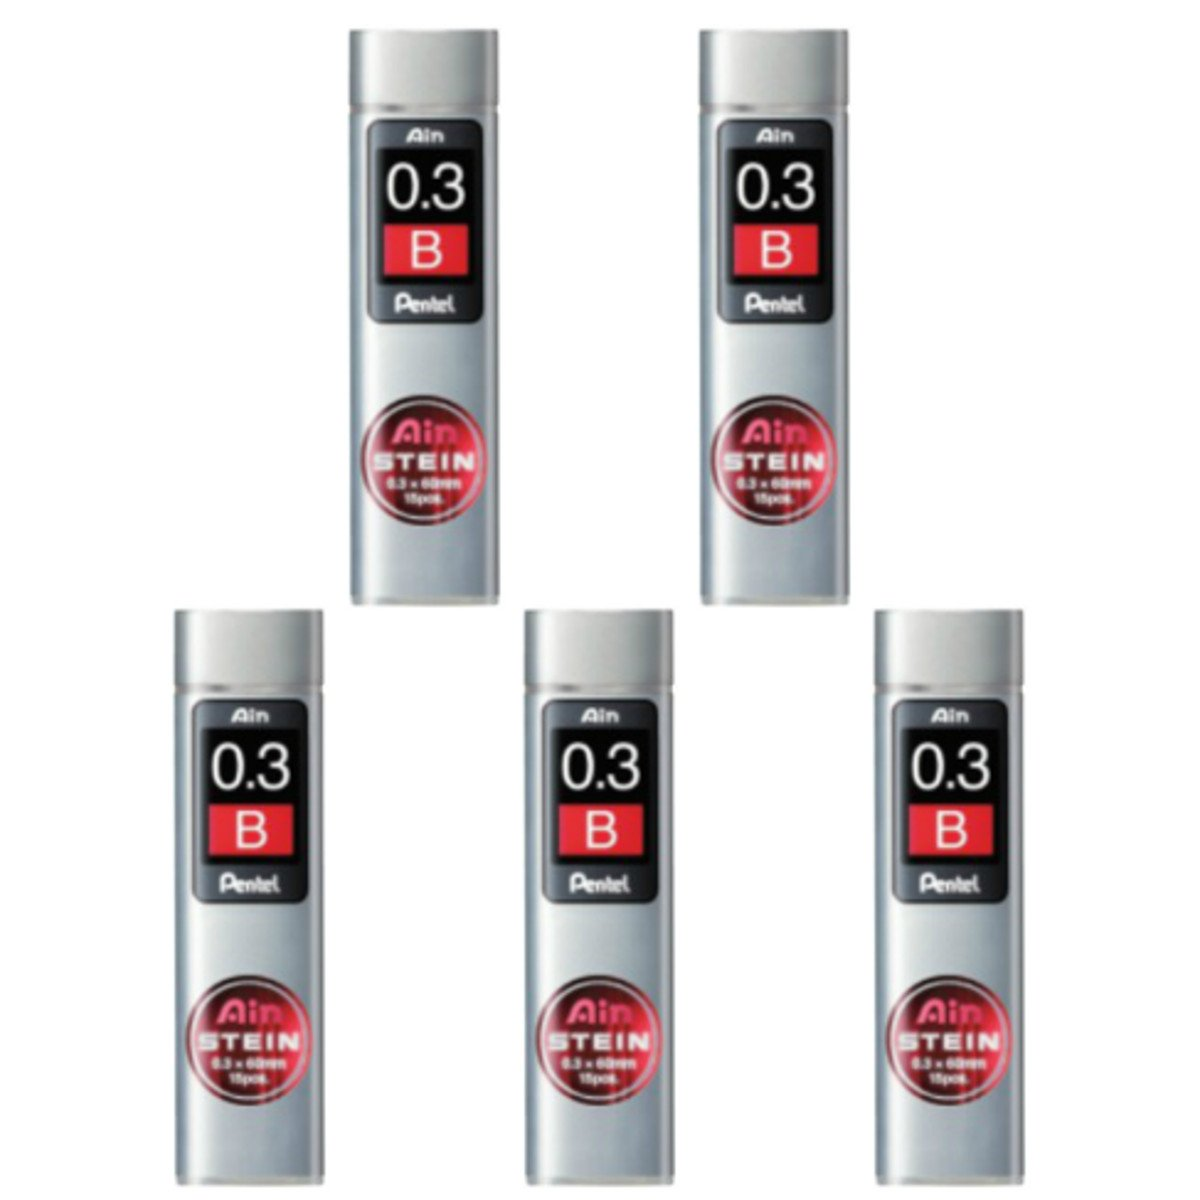 Pentel Ain Mechanical Pencil Leads 0.3mm B, 5 Pack/total 75 Leads Value Set